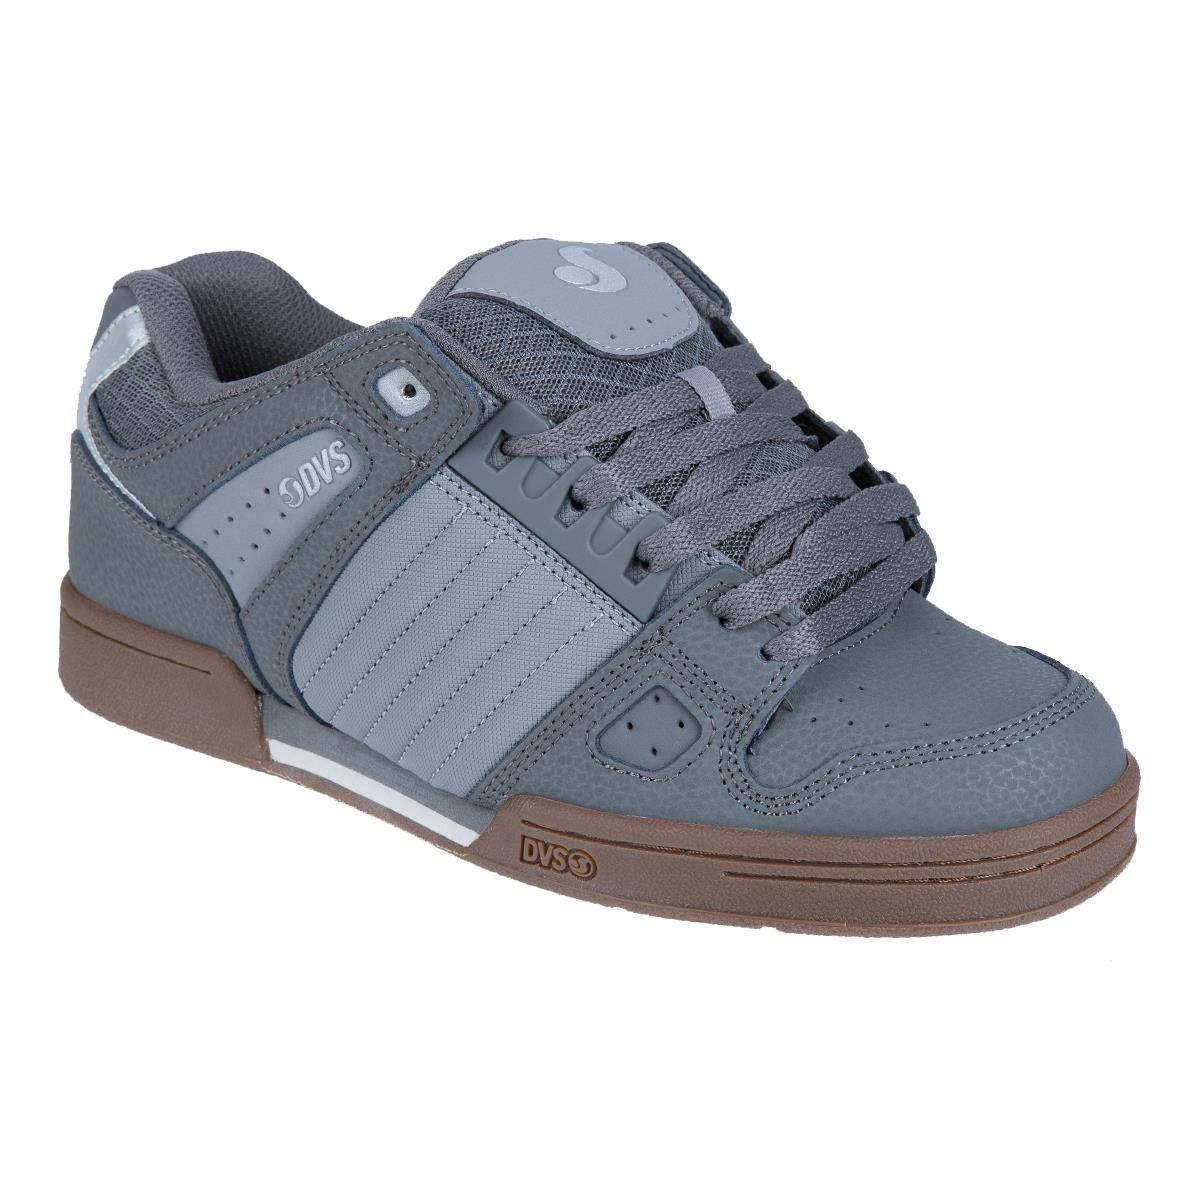 DVS Schuhe Celsius Charcoal/Grau Nubuk